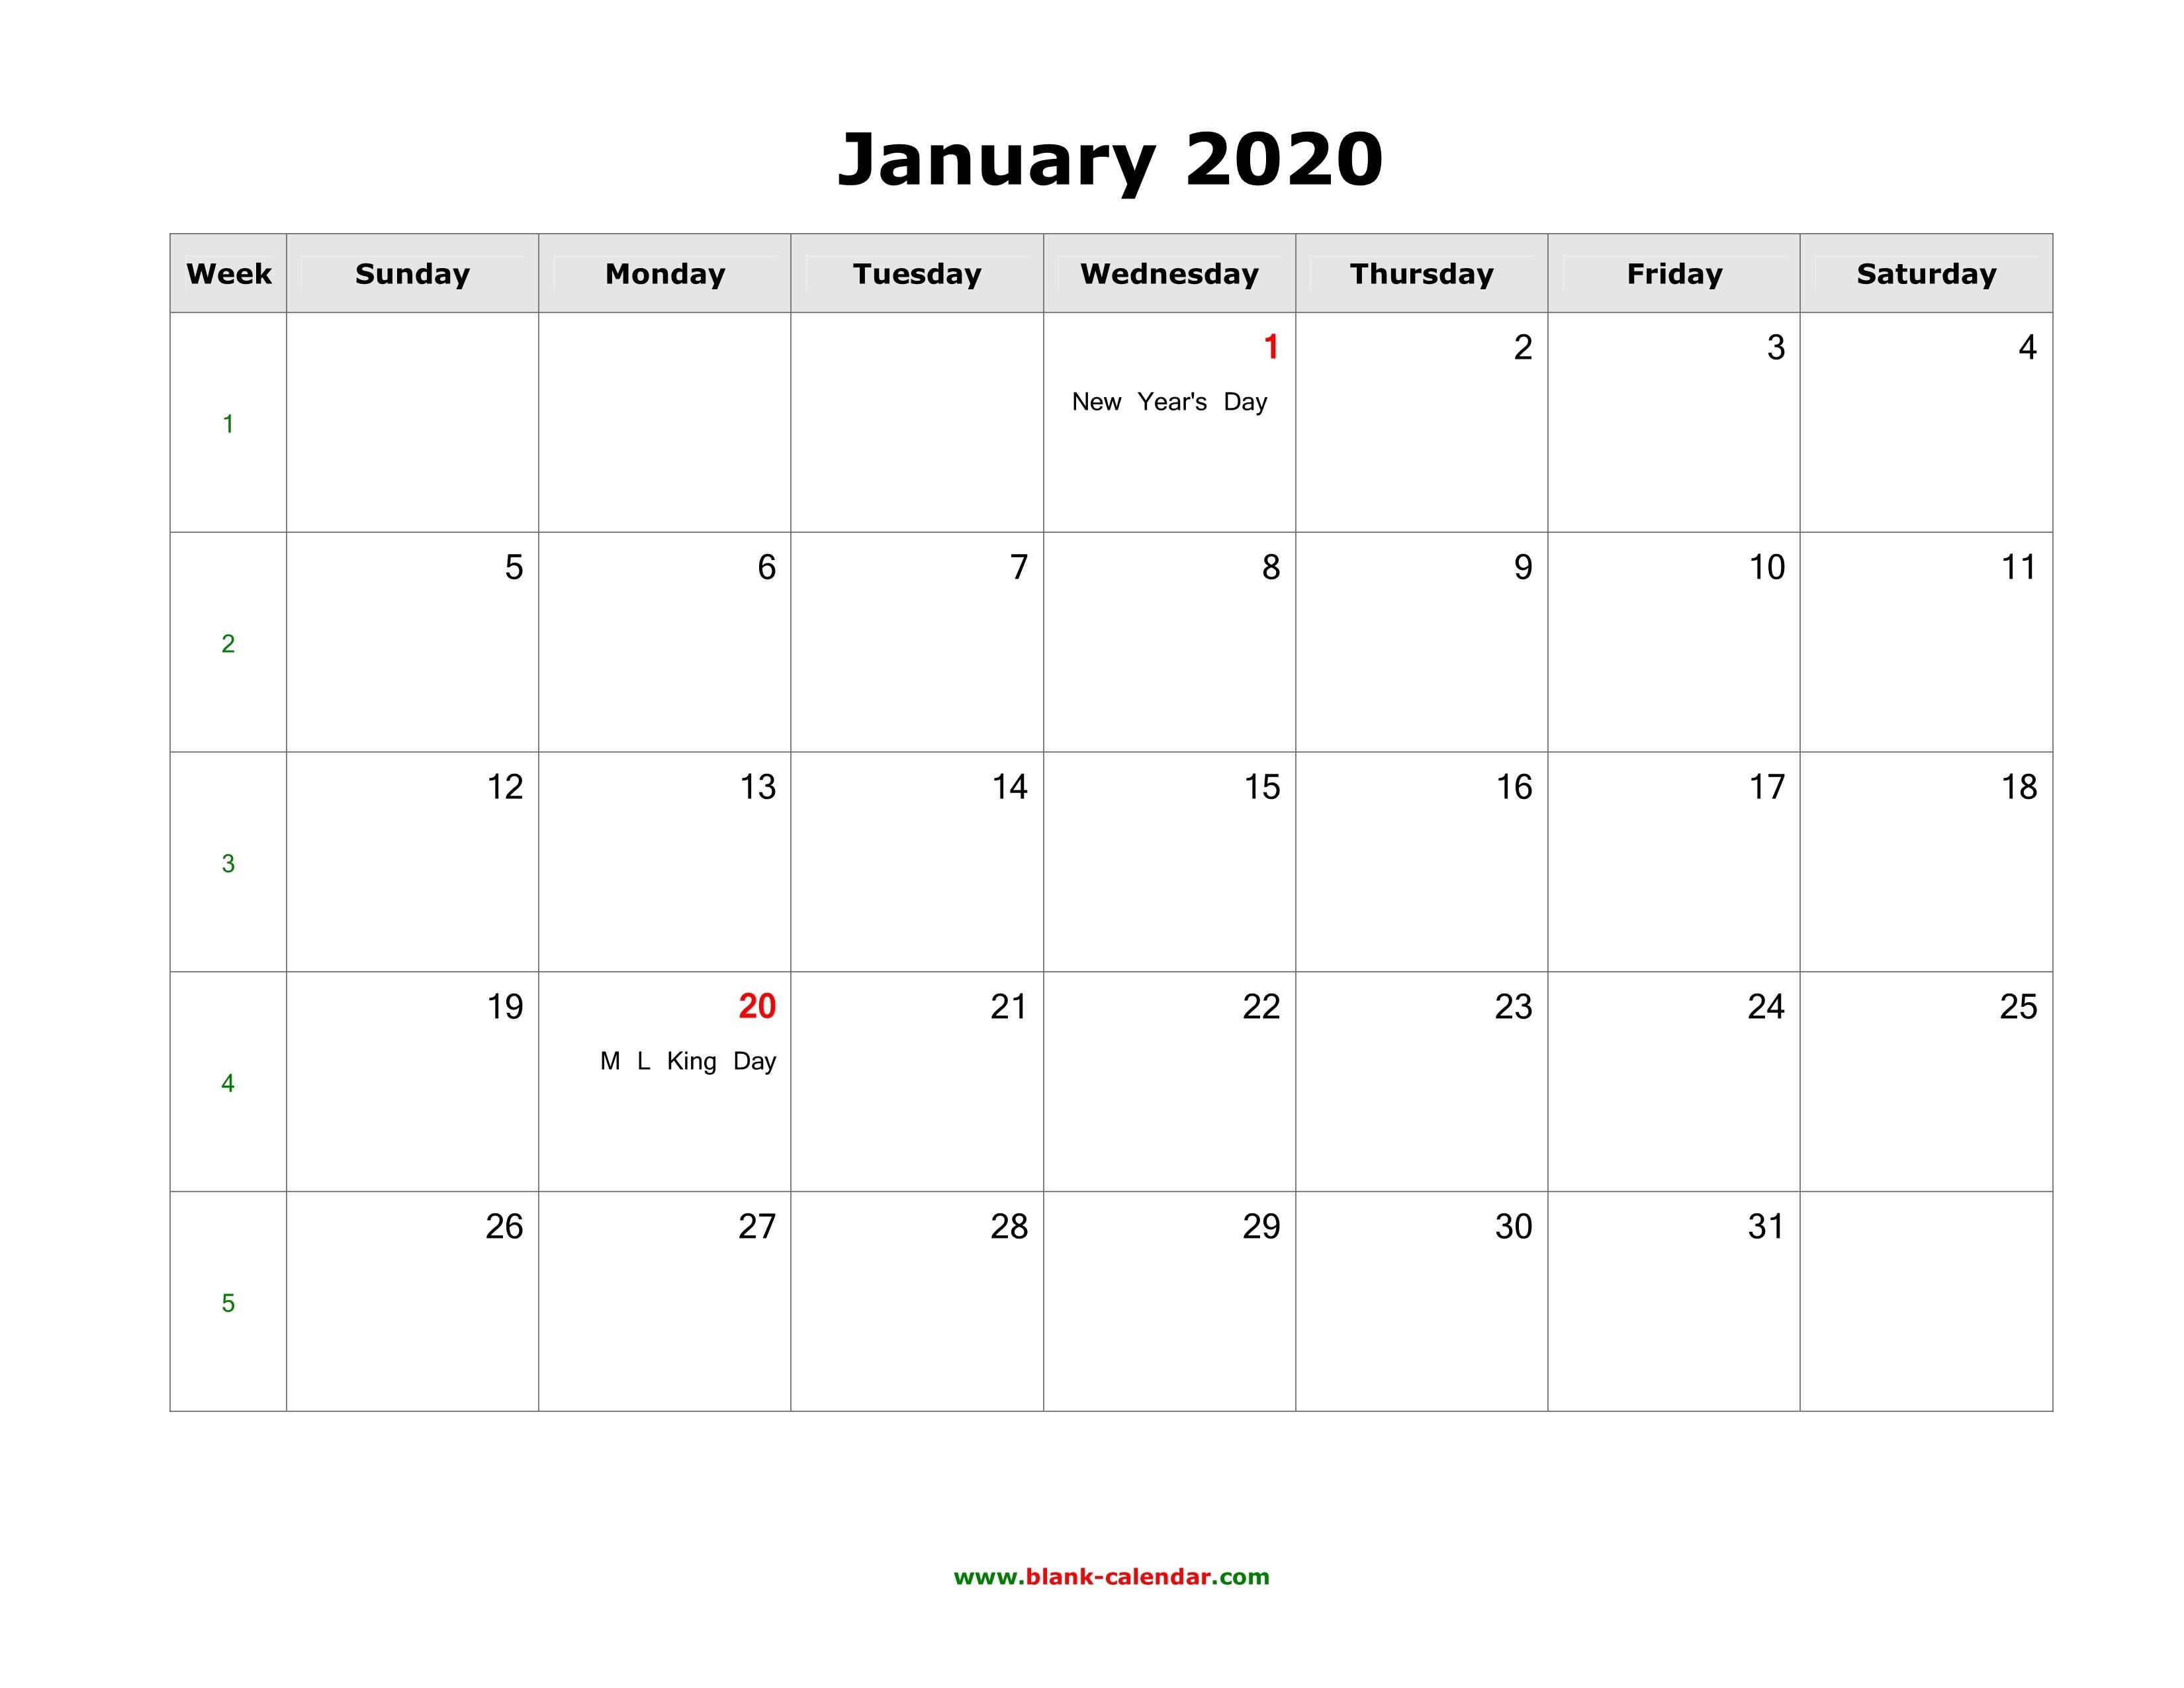 January 2020 Blank Calendar | Free Download Calendar Templates-January 2020 Printable Calendar With Holidays